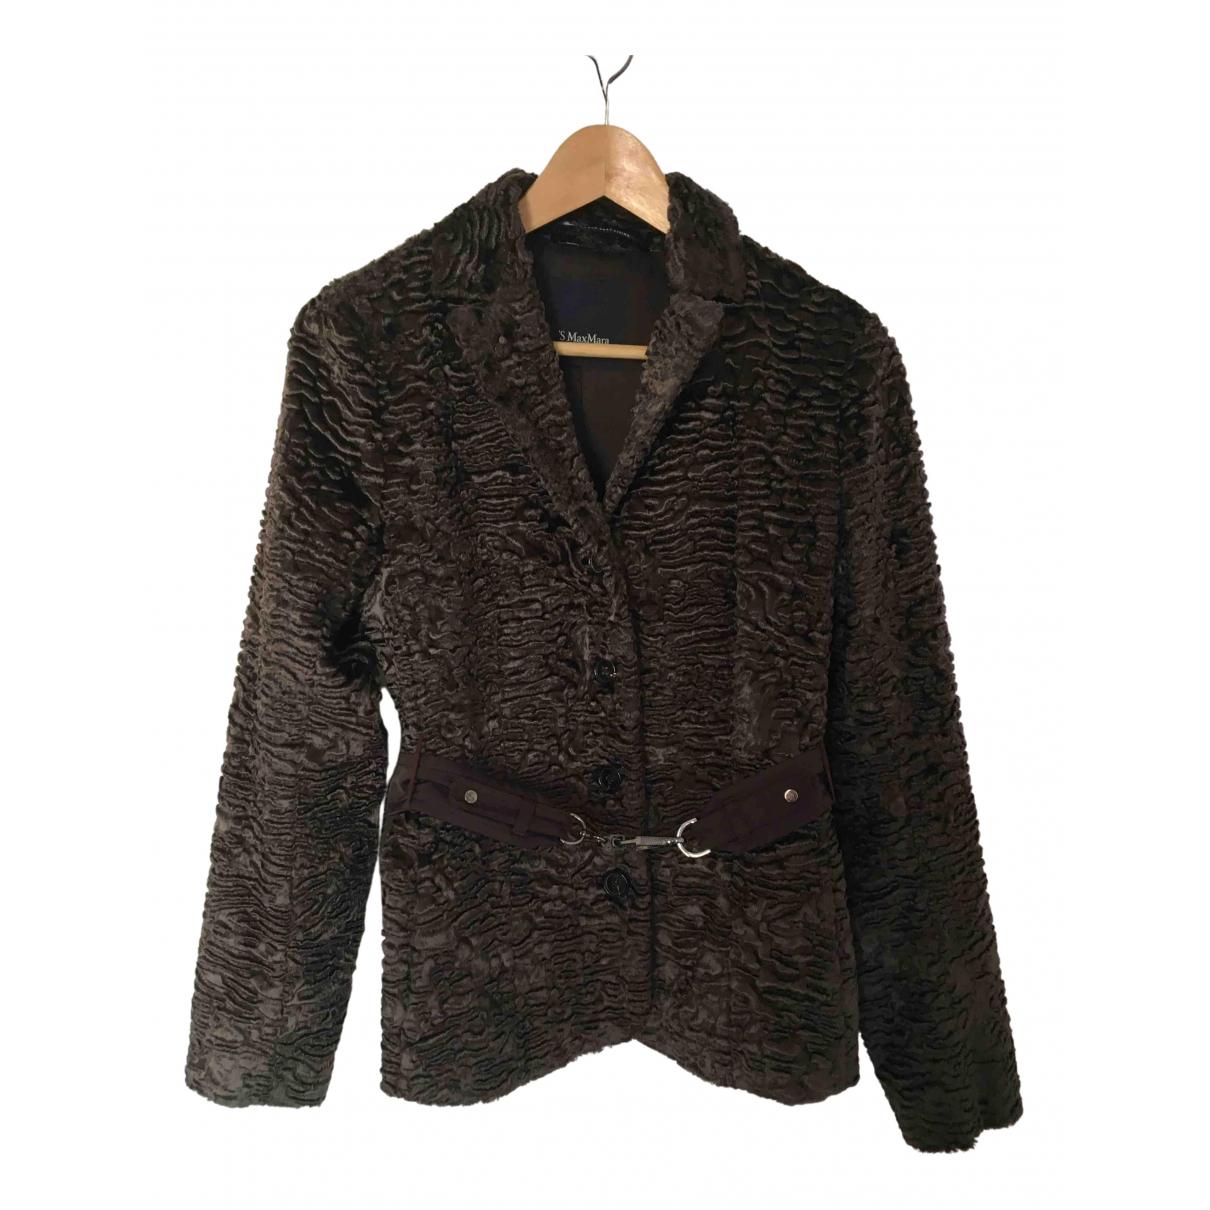 Max Mara 's \N Brown jacket for Women 36 FR